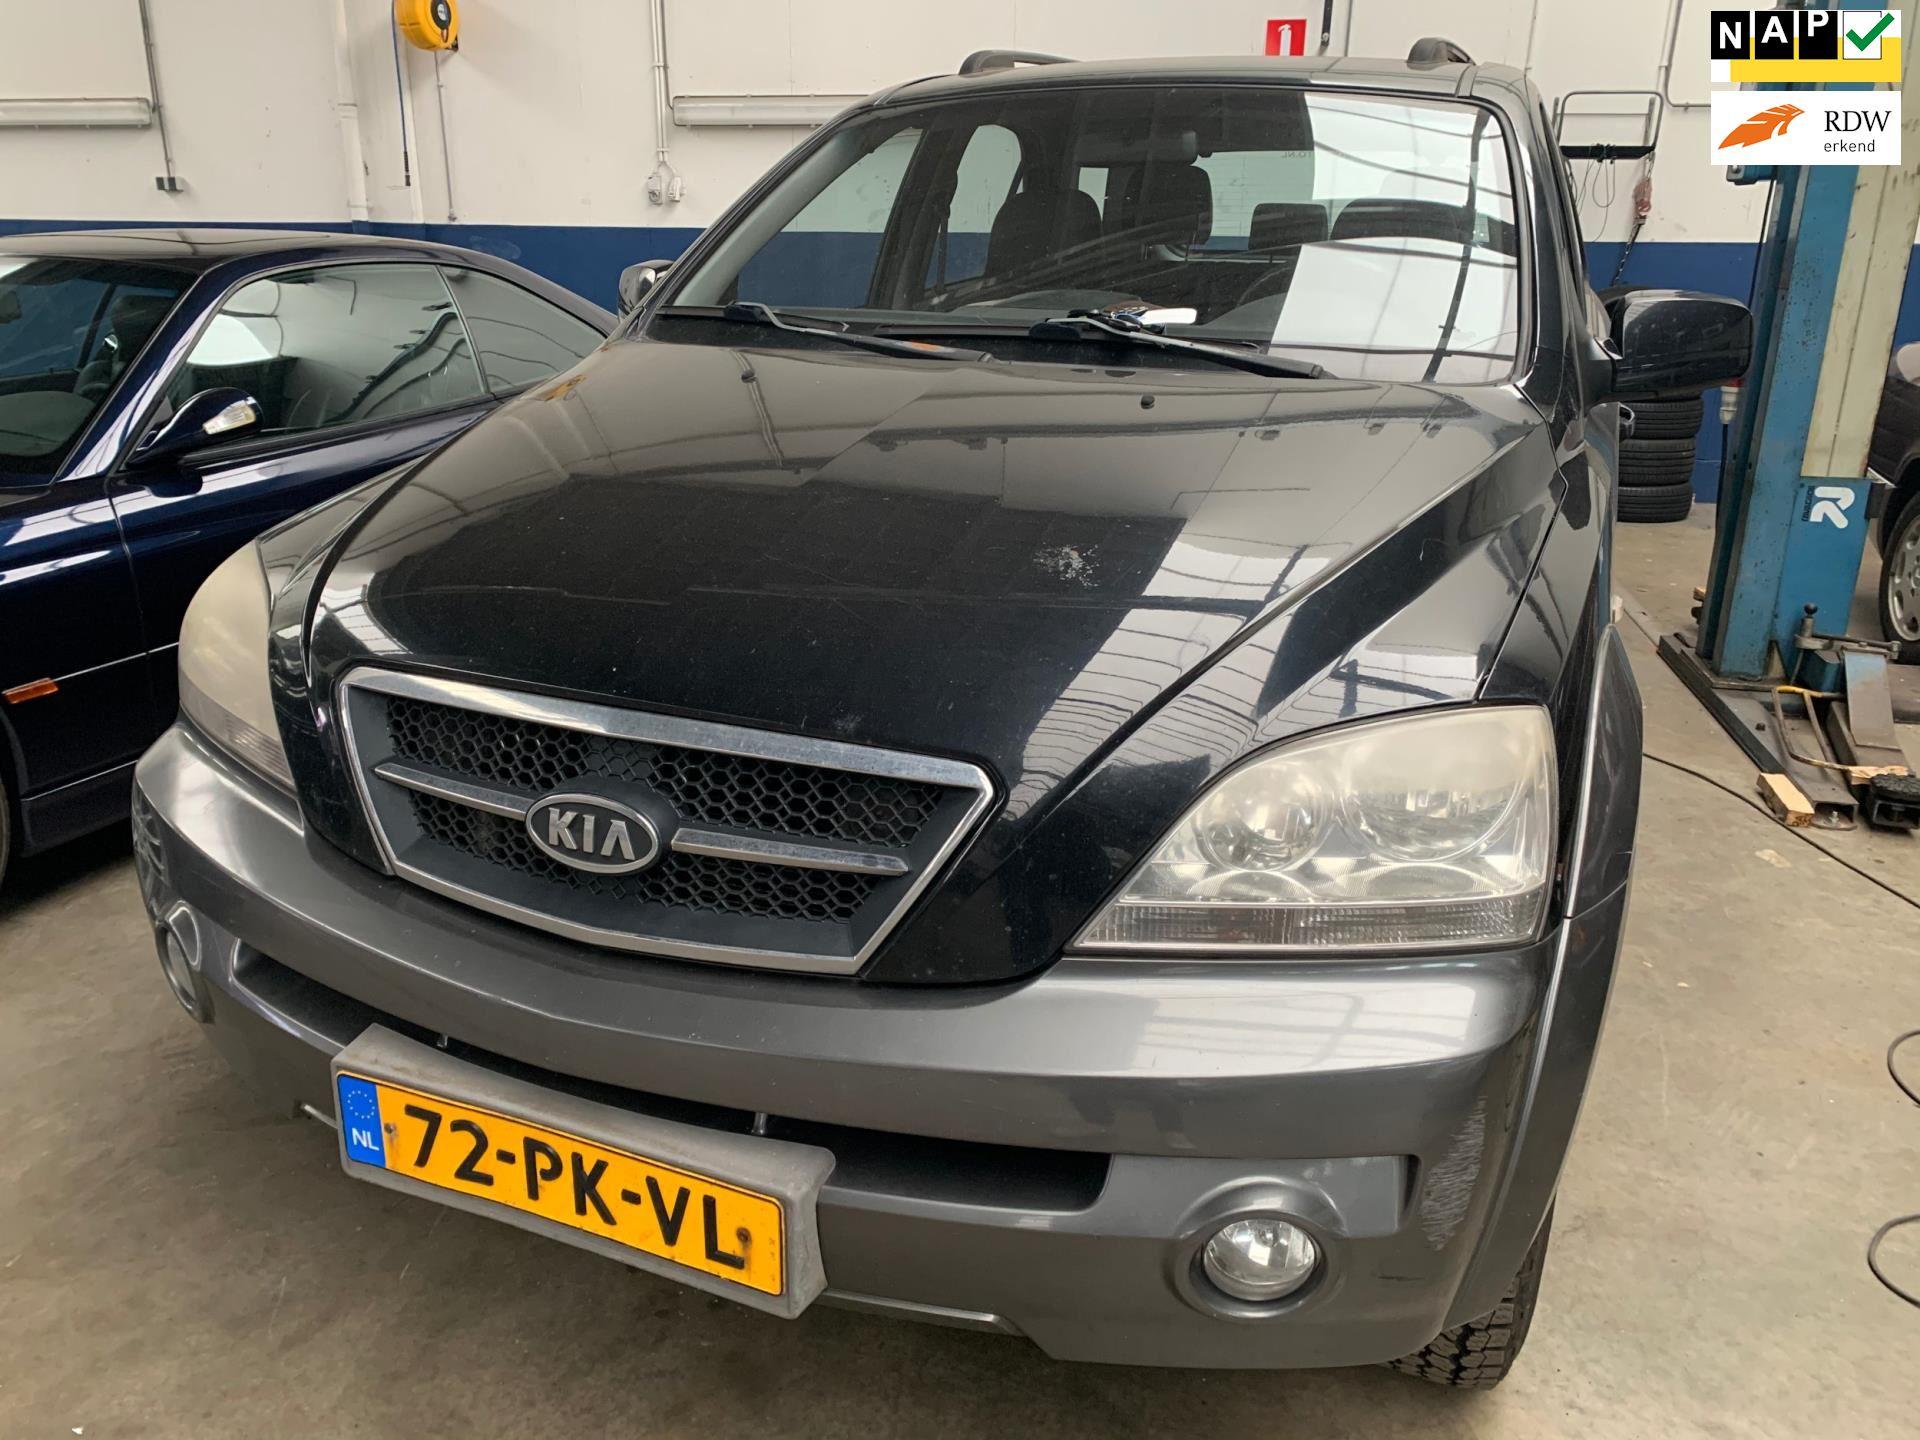 Kia Sorento occasion - Dordt-West Car Centre BV